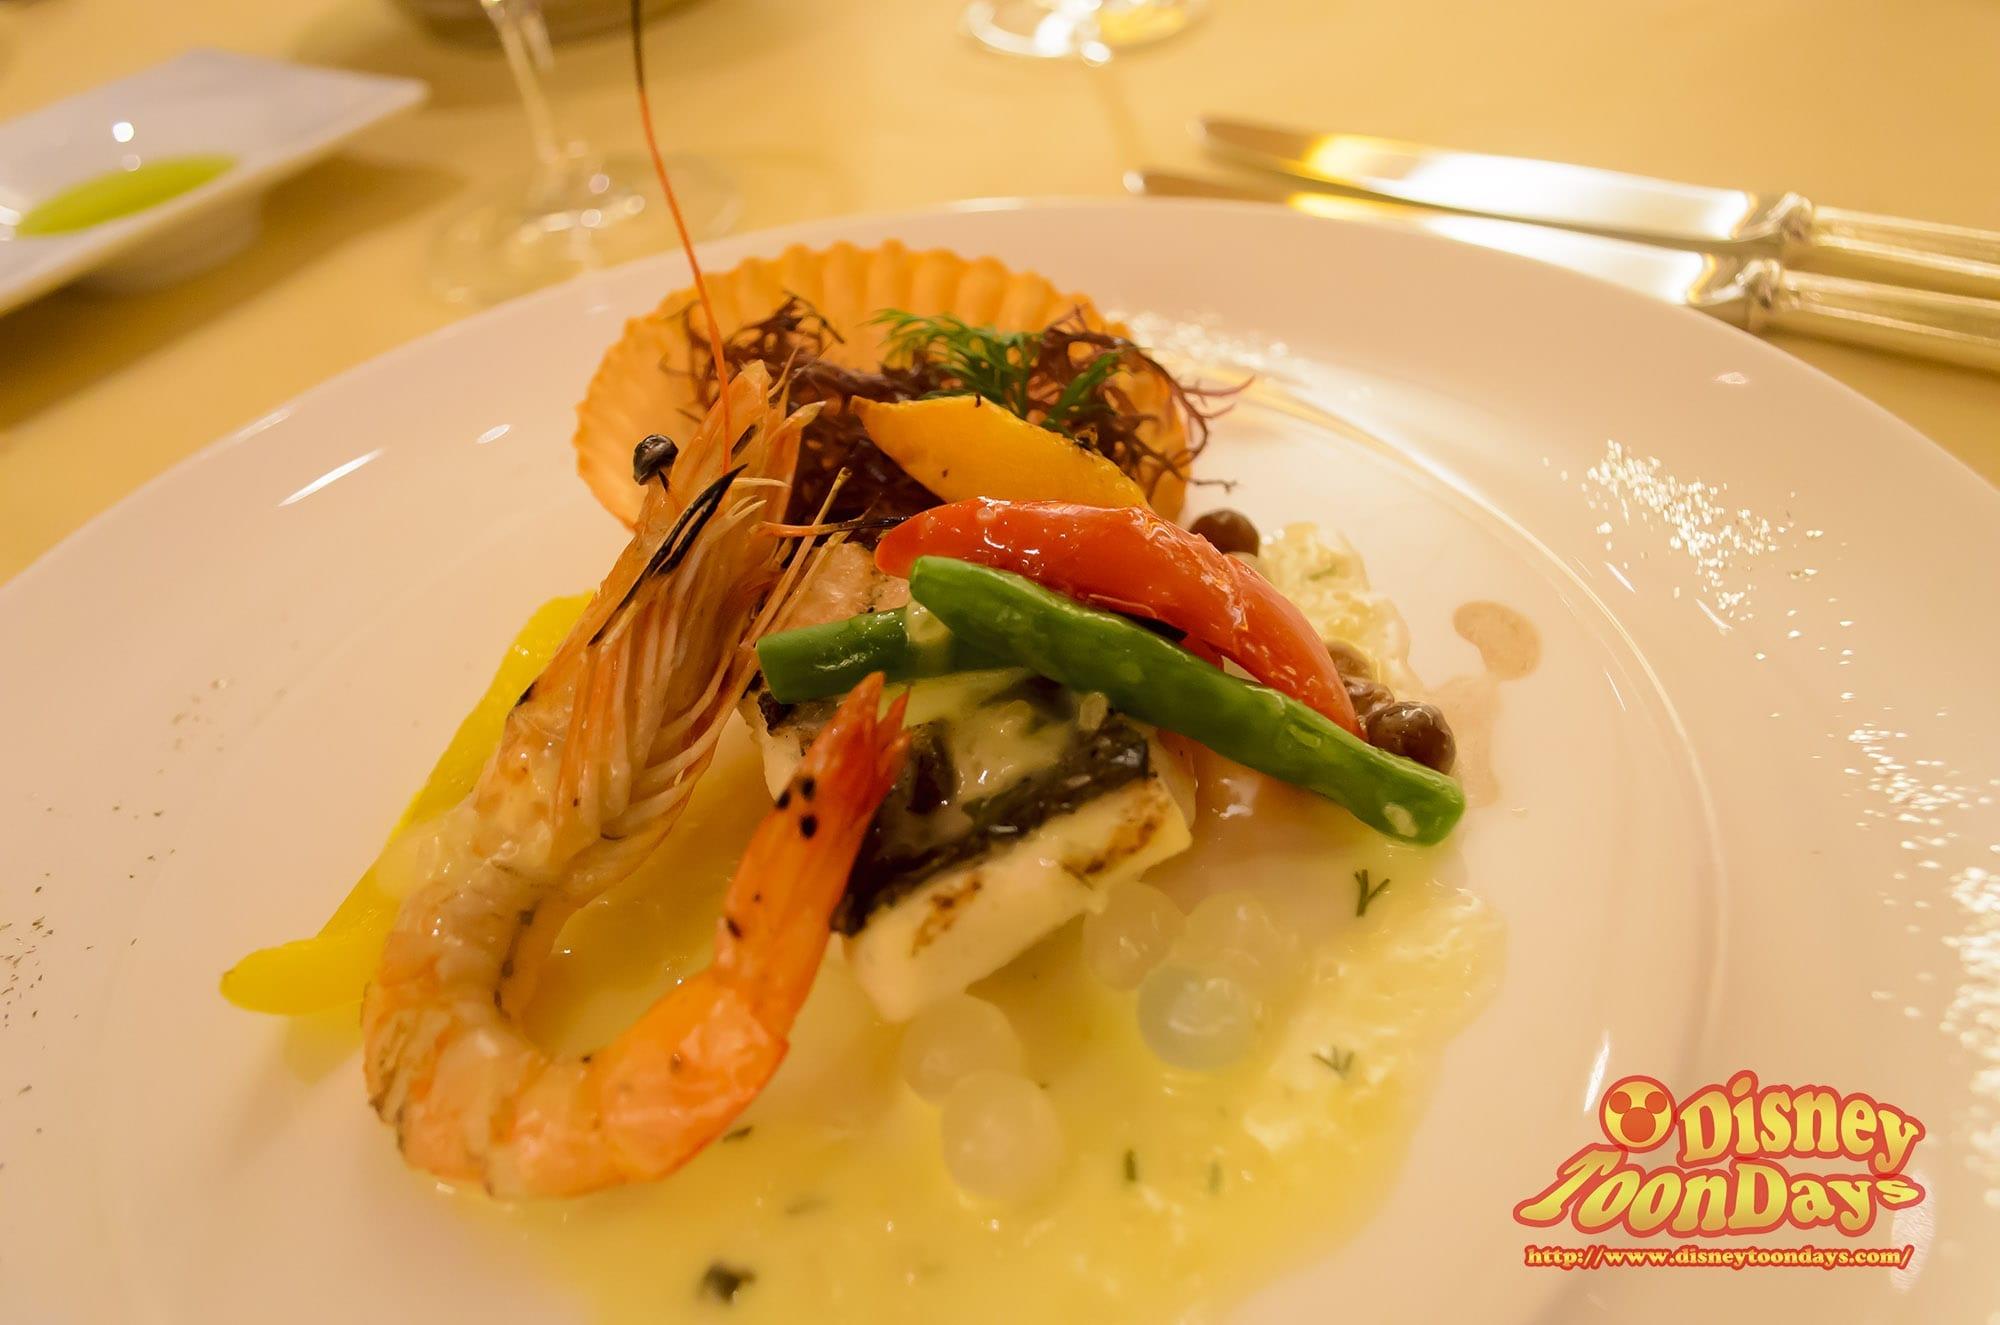 TDR ディズニーアンバサダーホテル エンパイアグリル マイアニバーサリーストーリー 本日の鮮魚のグリル 天使の海老と季節の野菜 ハーブバターソース レモン風味